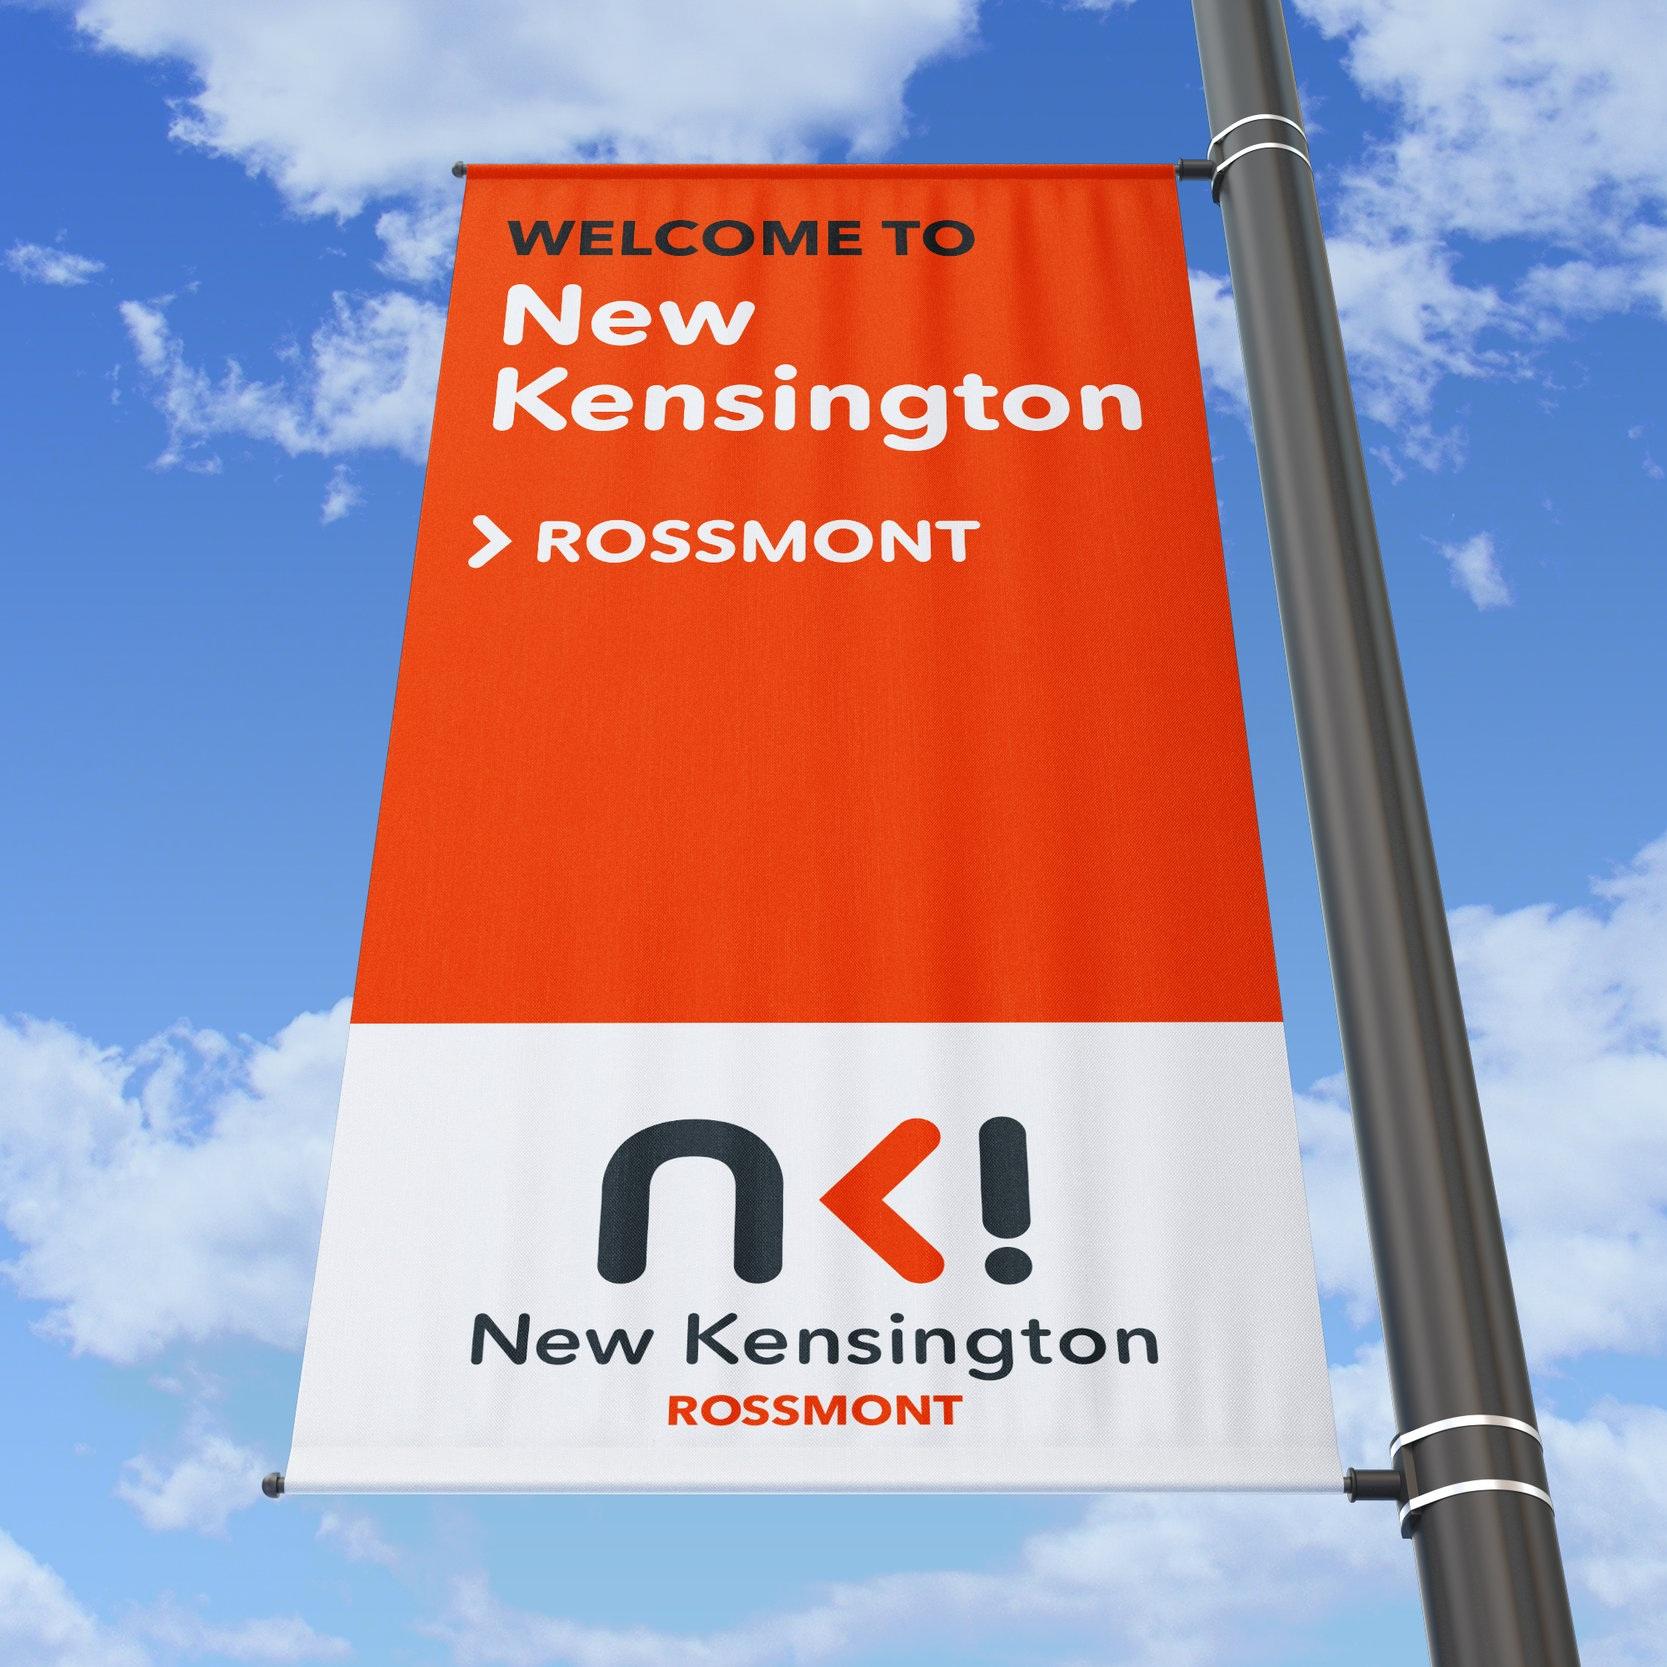 NewKen_Welcome_Poster_Concept1_Rossmont.jpg